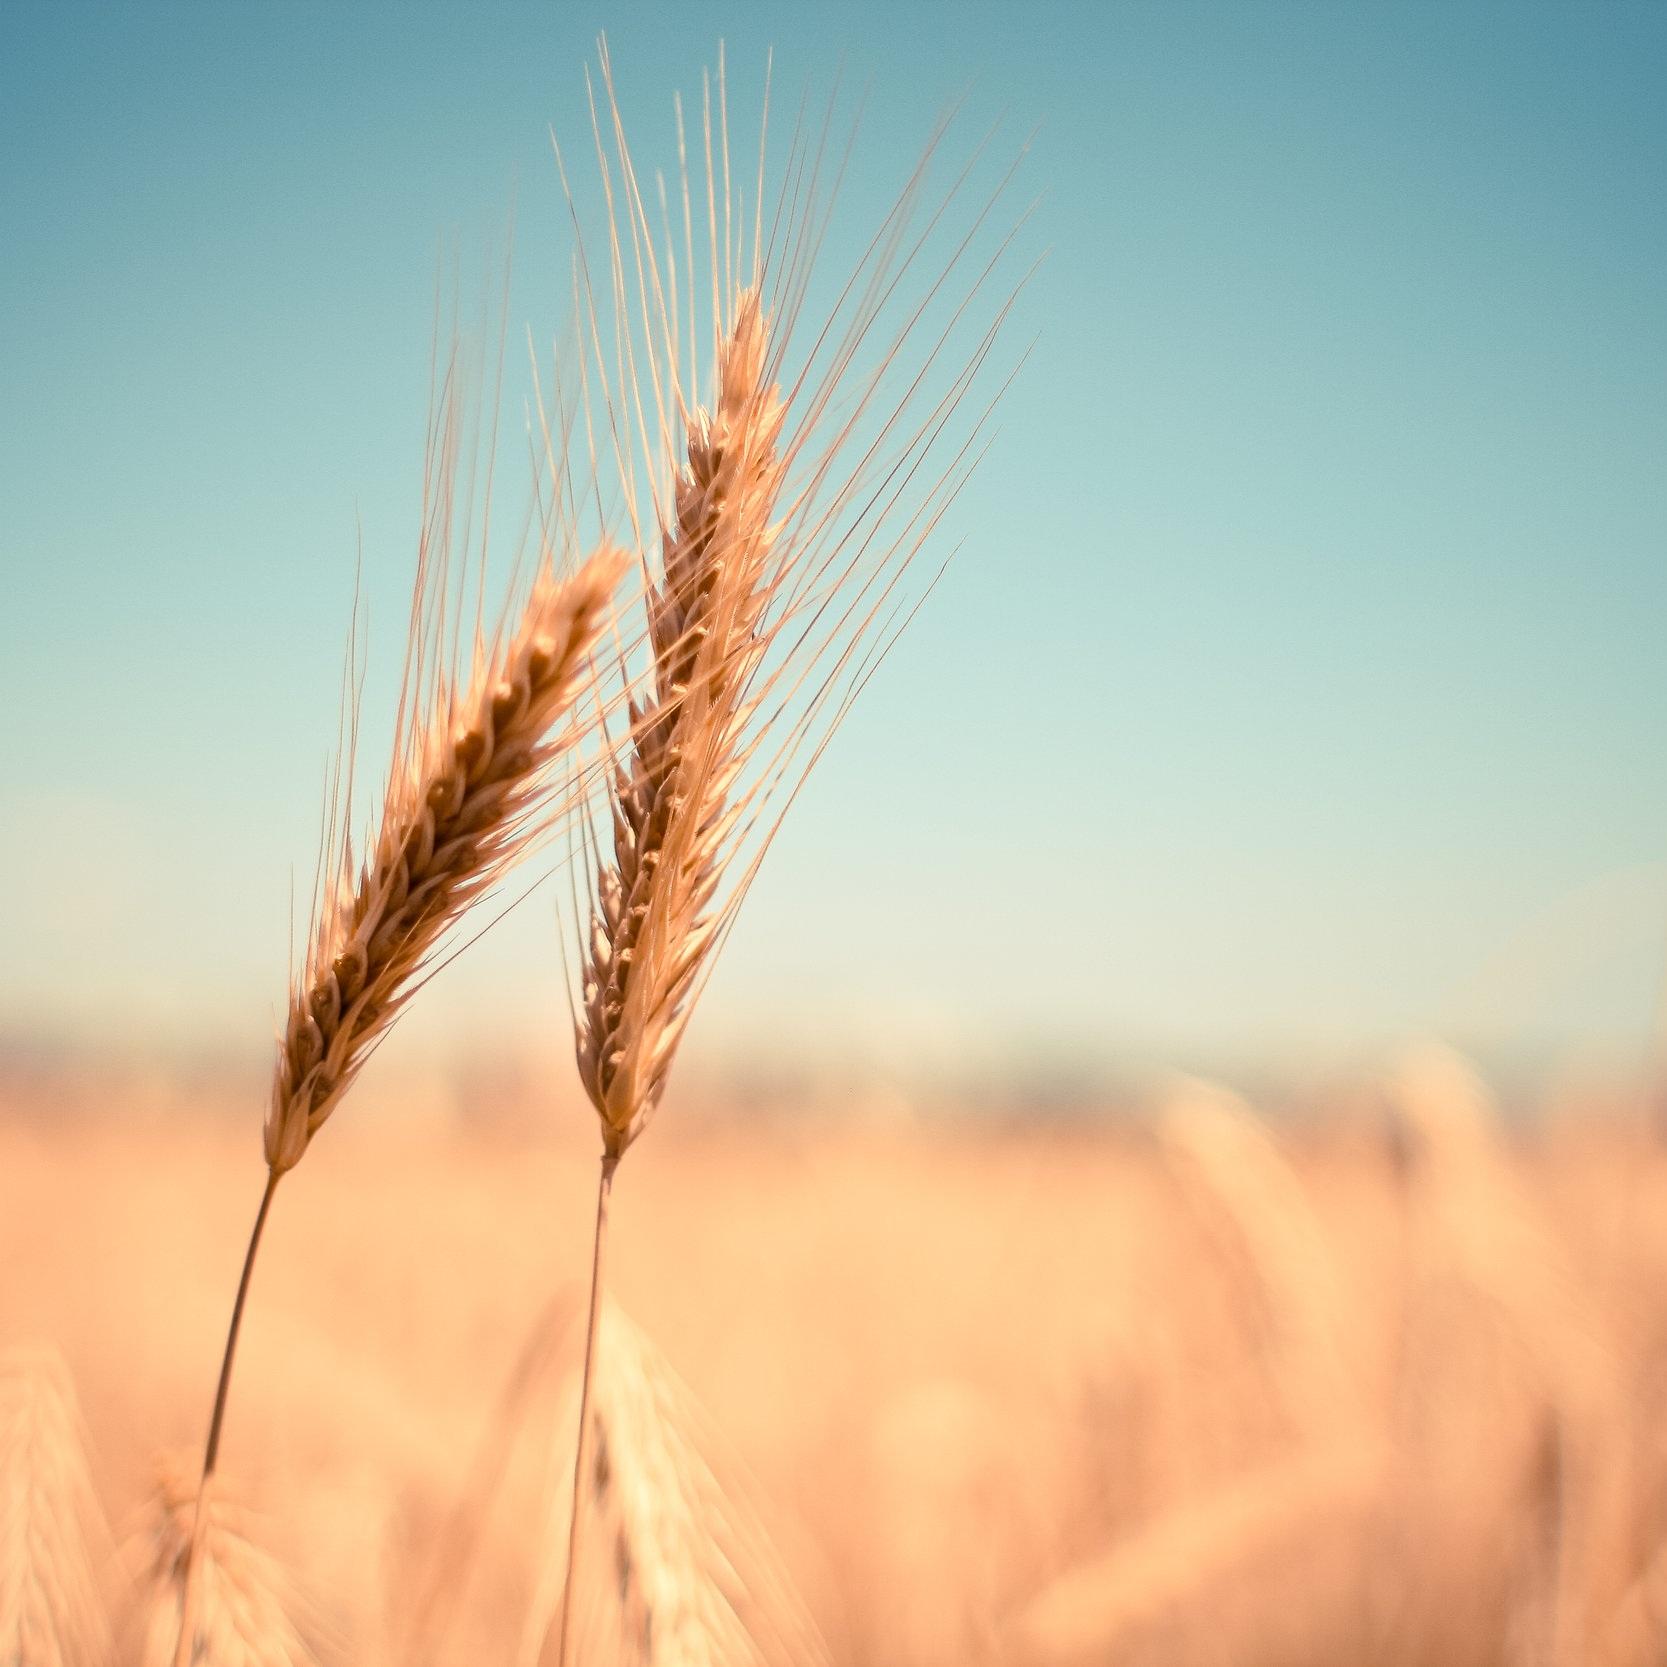 grain-field-detail-picjumbo-com.jpg